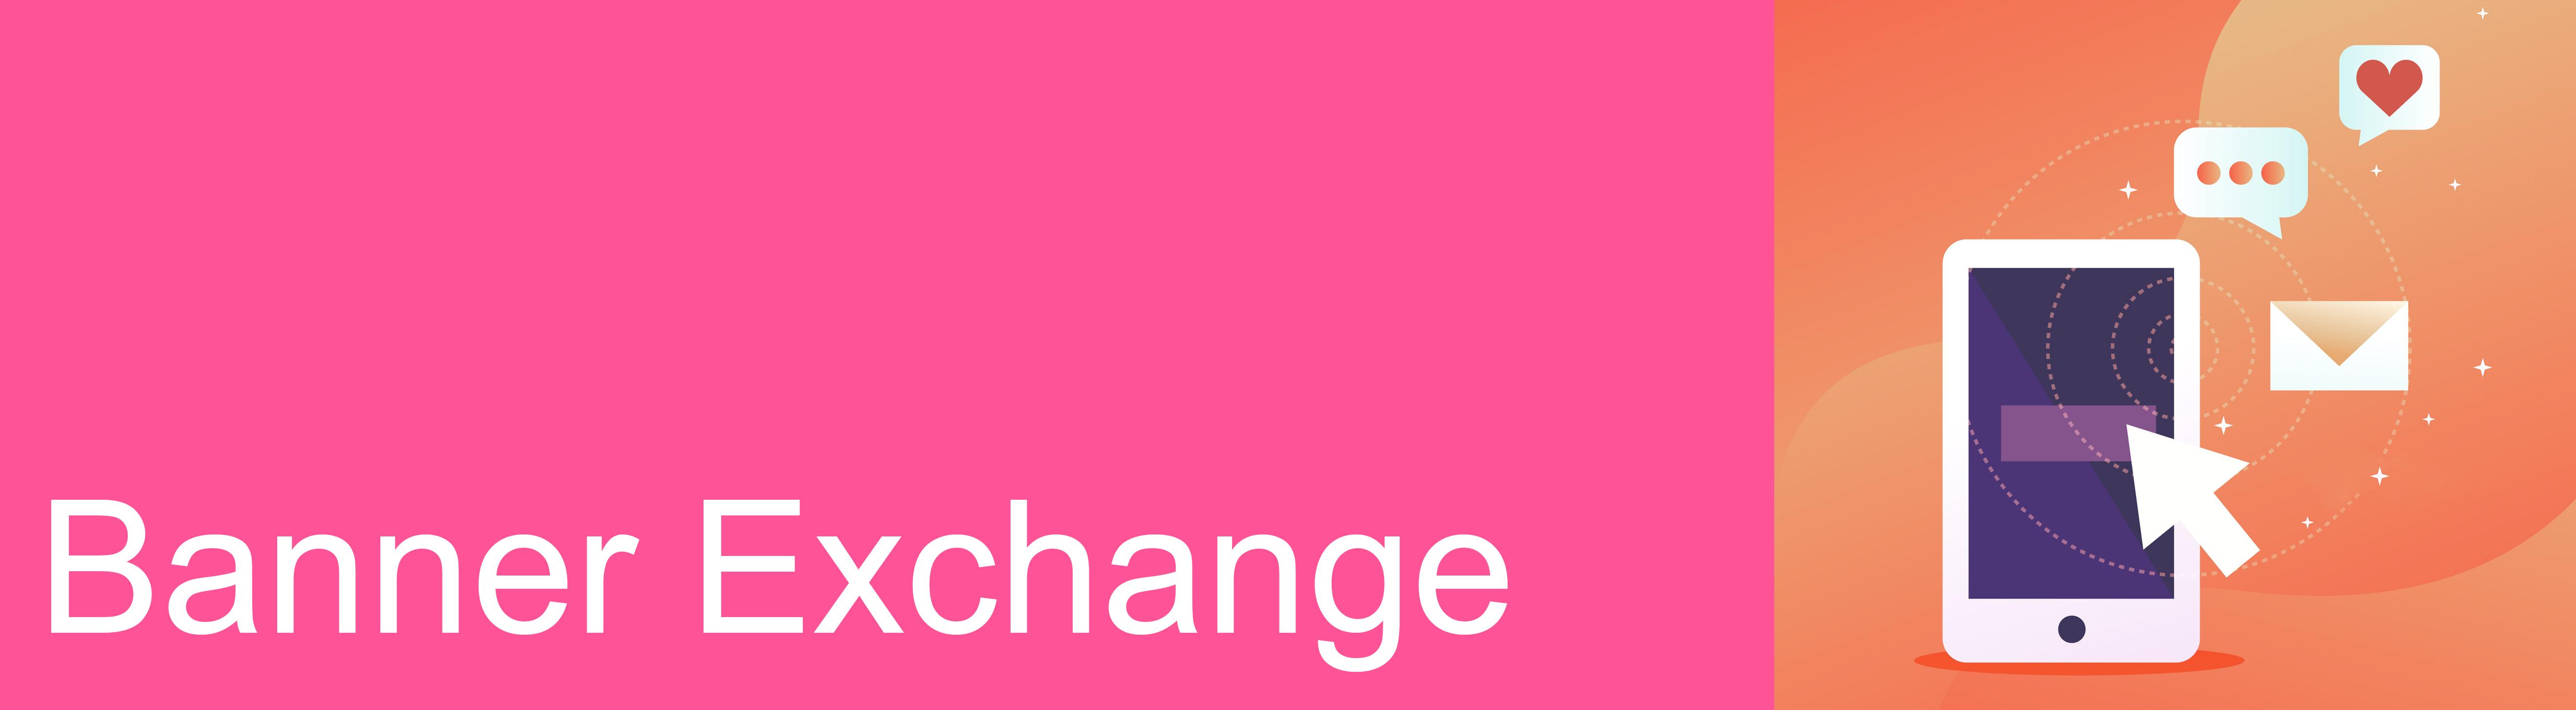 banner-exchange.jpg